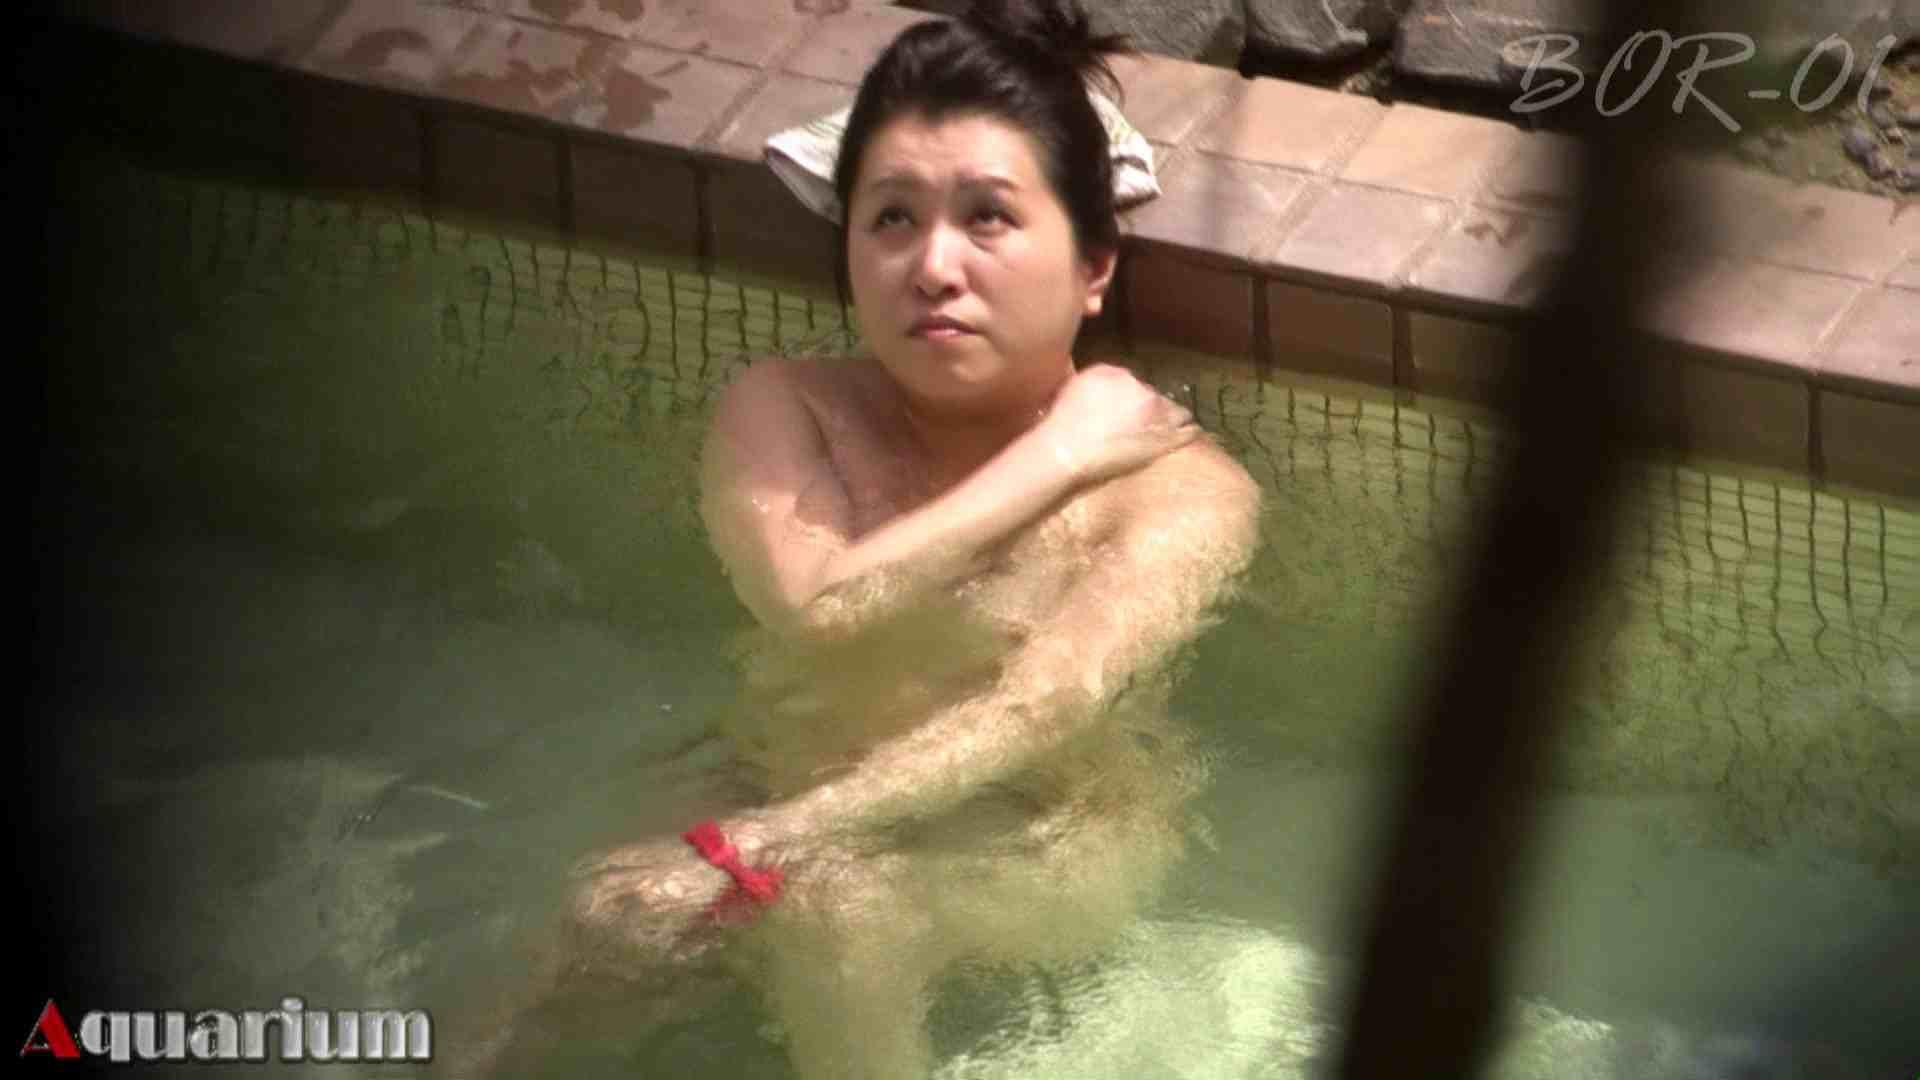 Aquaな露天風呂Vol.458 露天風呂 | OLのエロ生活  29連発 13